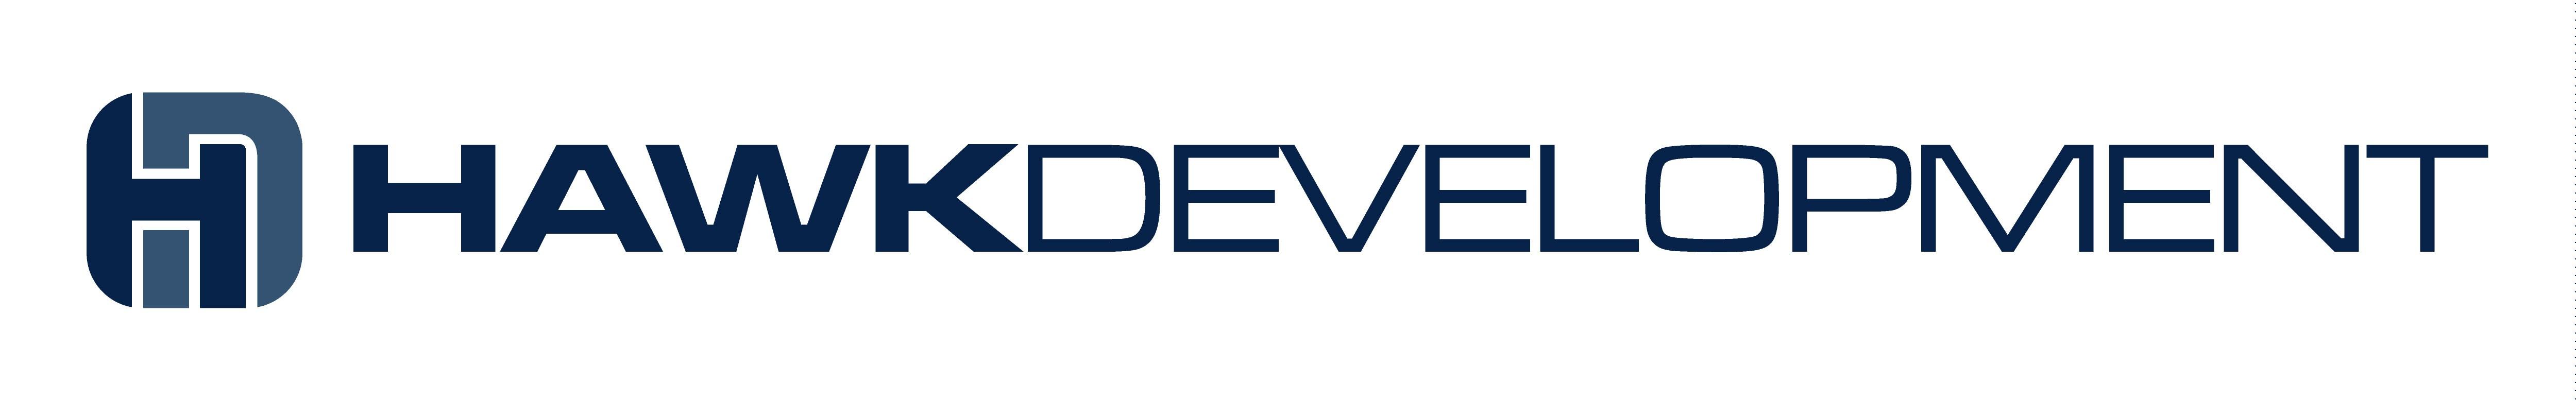 Design a simple, modern logo for a new development firm located in Niagara Falls, Ontario